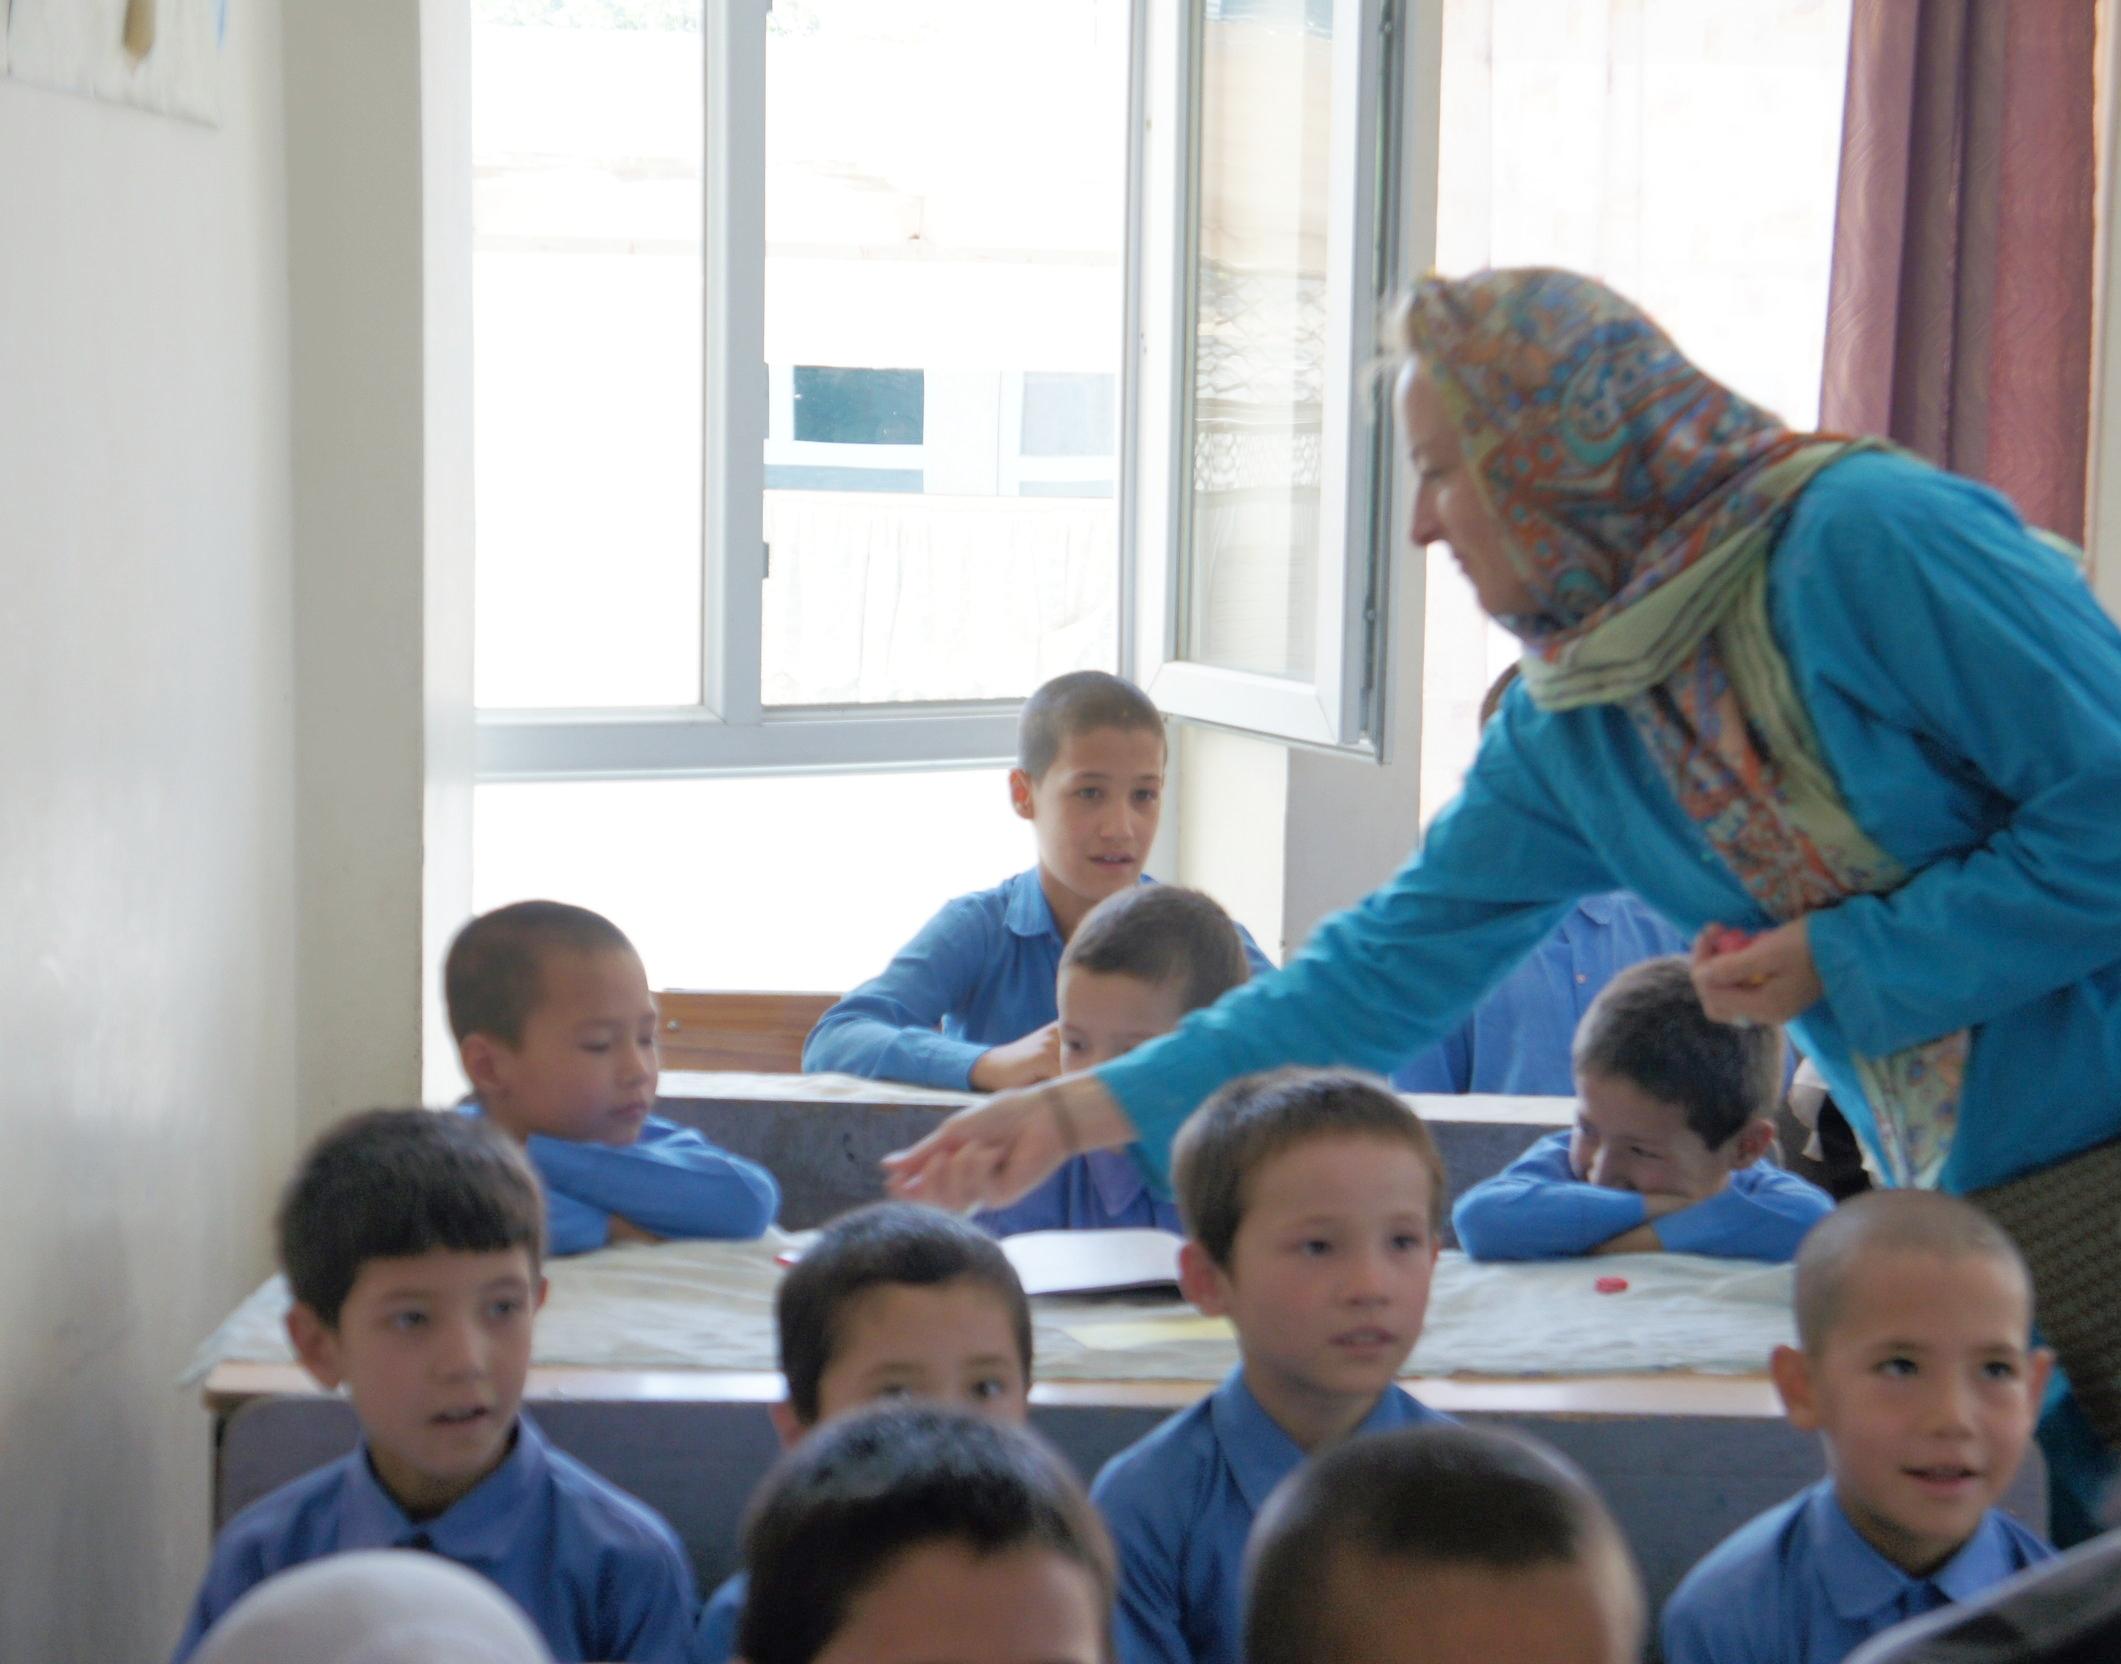 Jaweed - #3006 | MaleAge When Starting School: 9